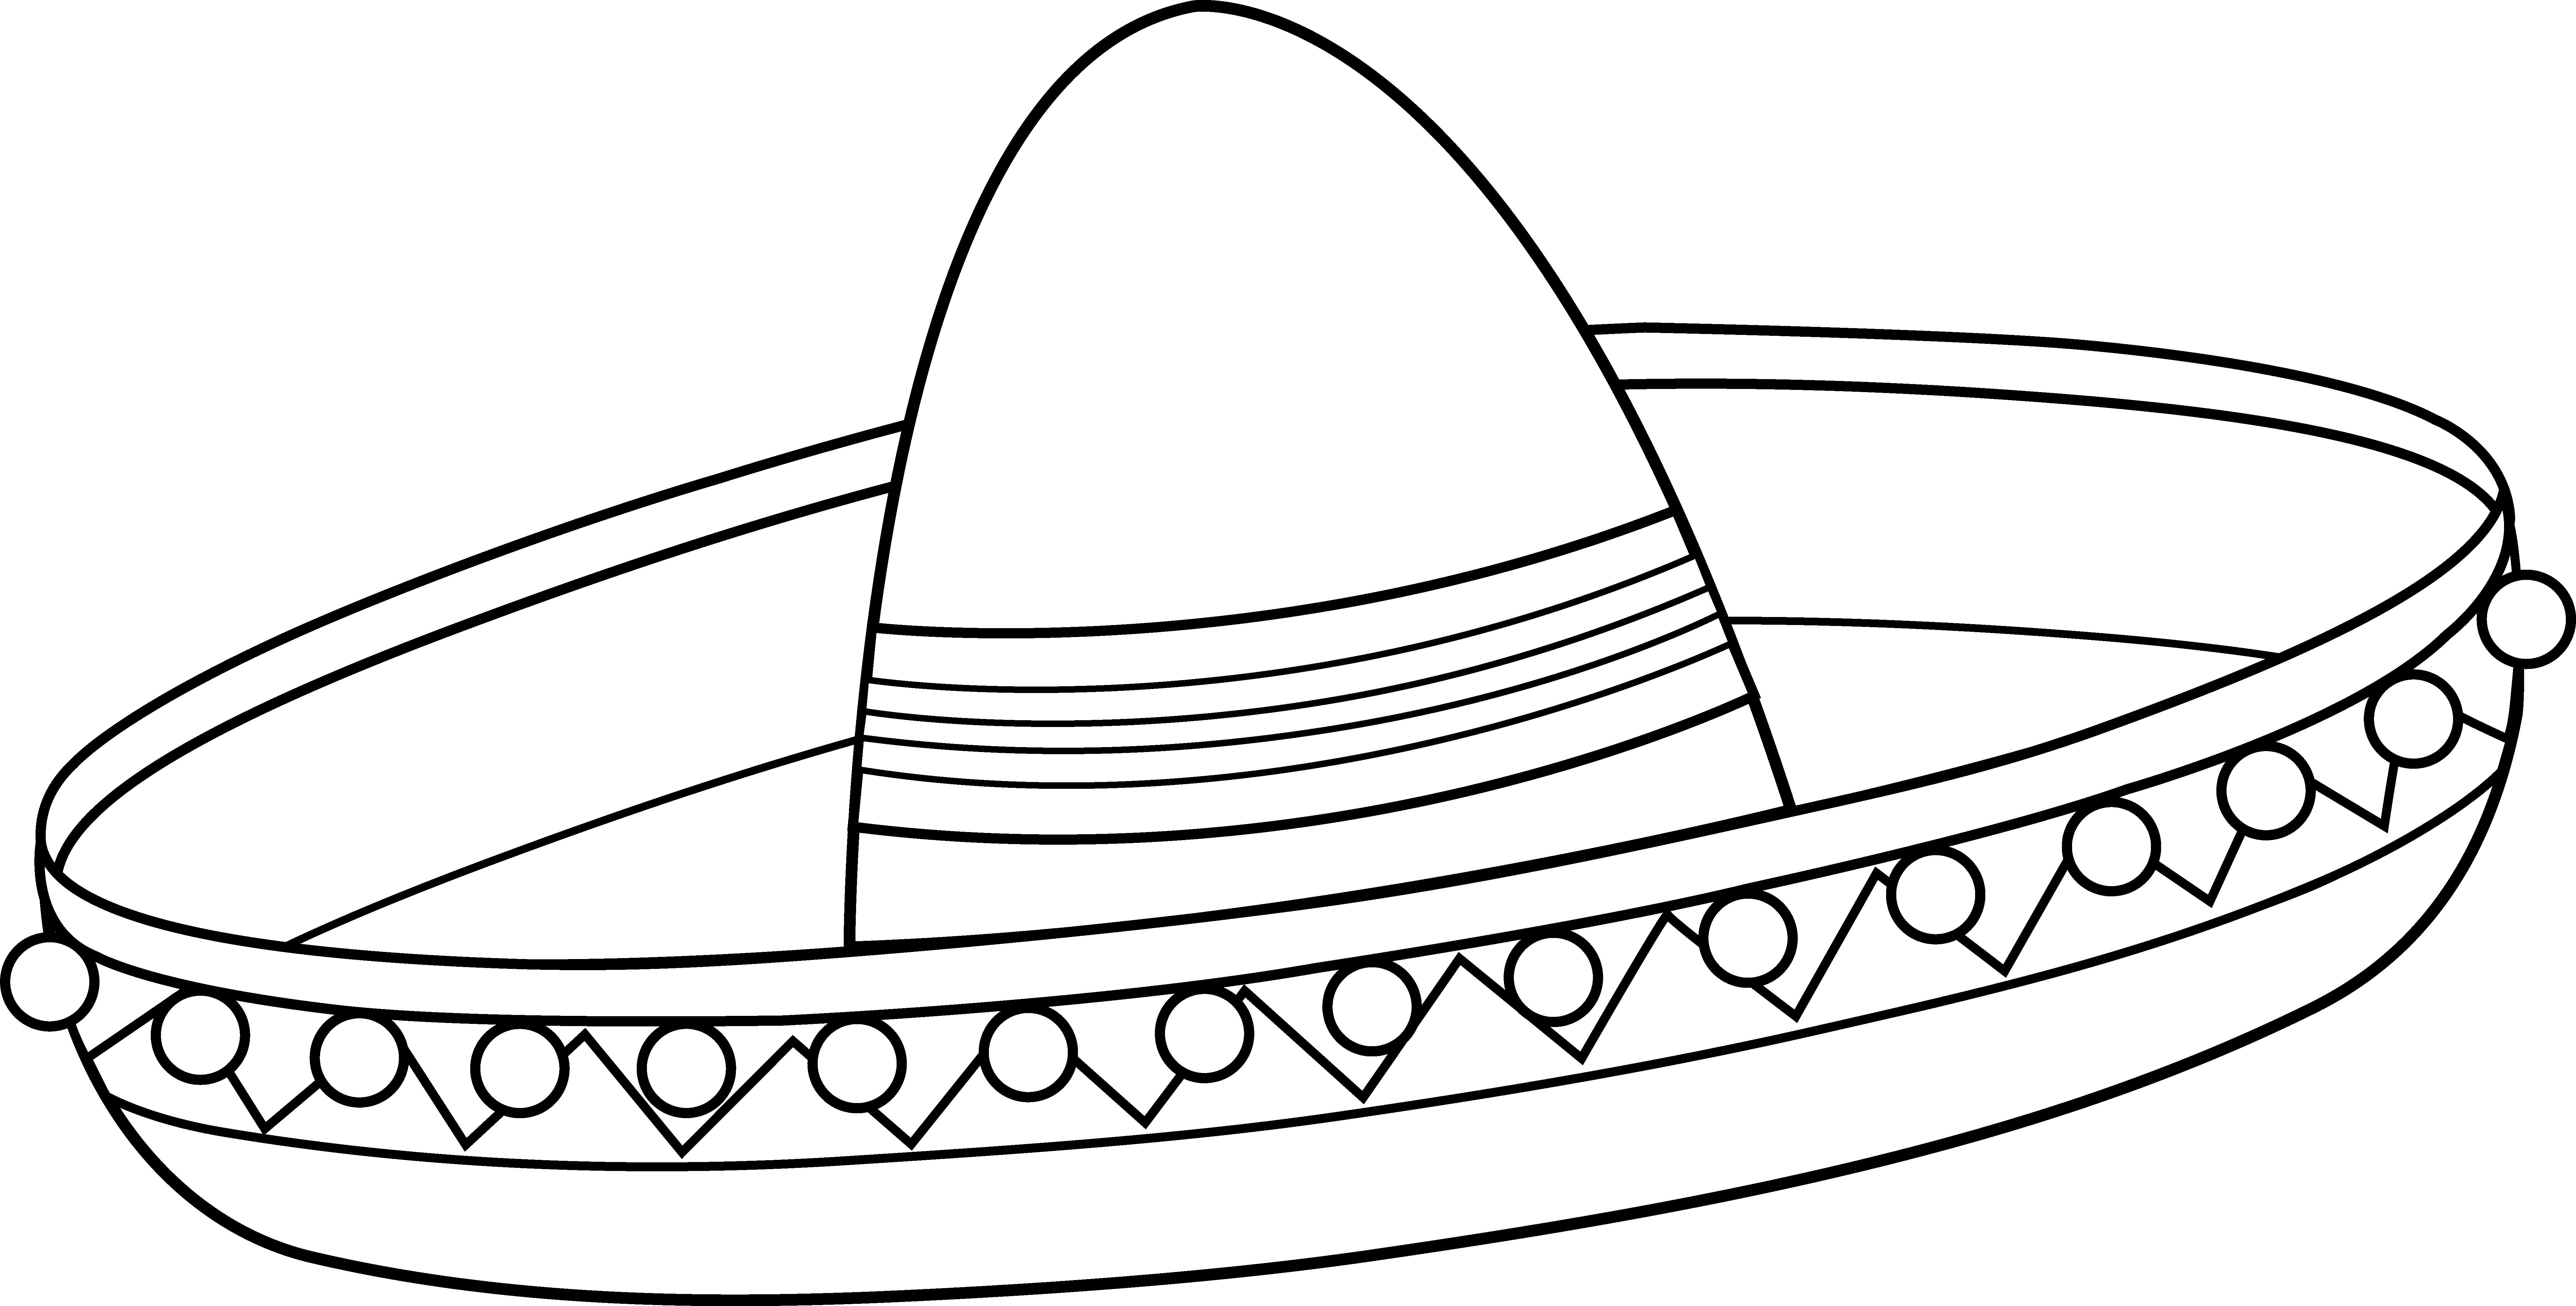 sombrero coloring page sombrero coloring page coloring pages kindergarten sombrero page coloring